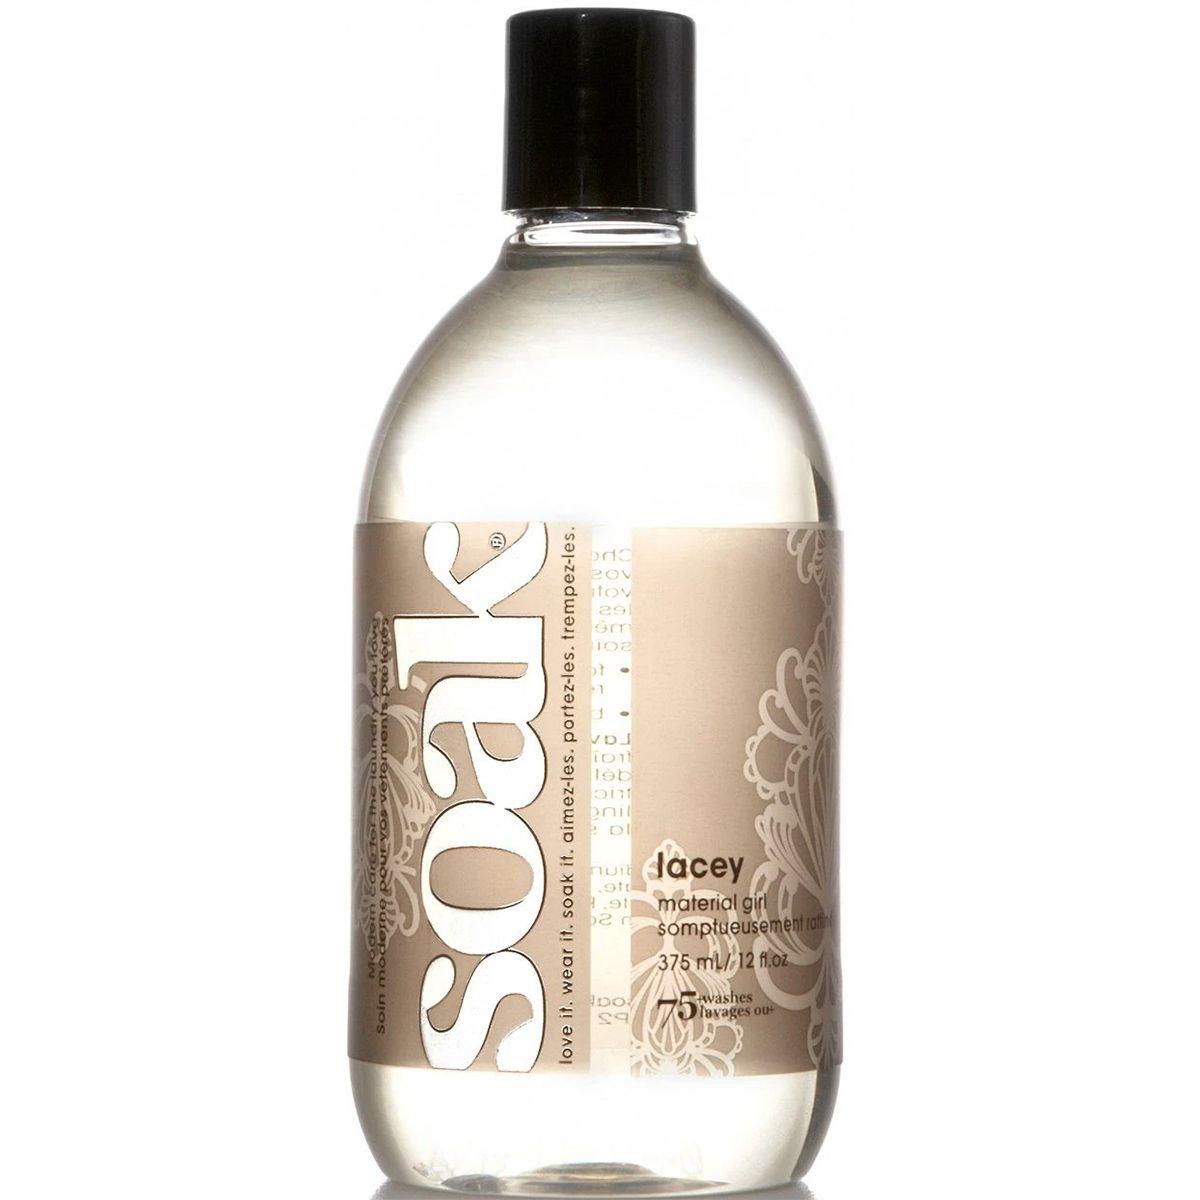 Lessive naturelle Soak Wash - Lacey 375 ml